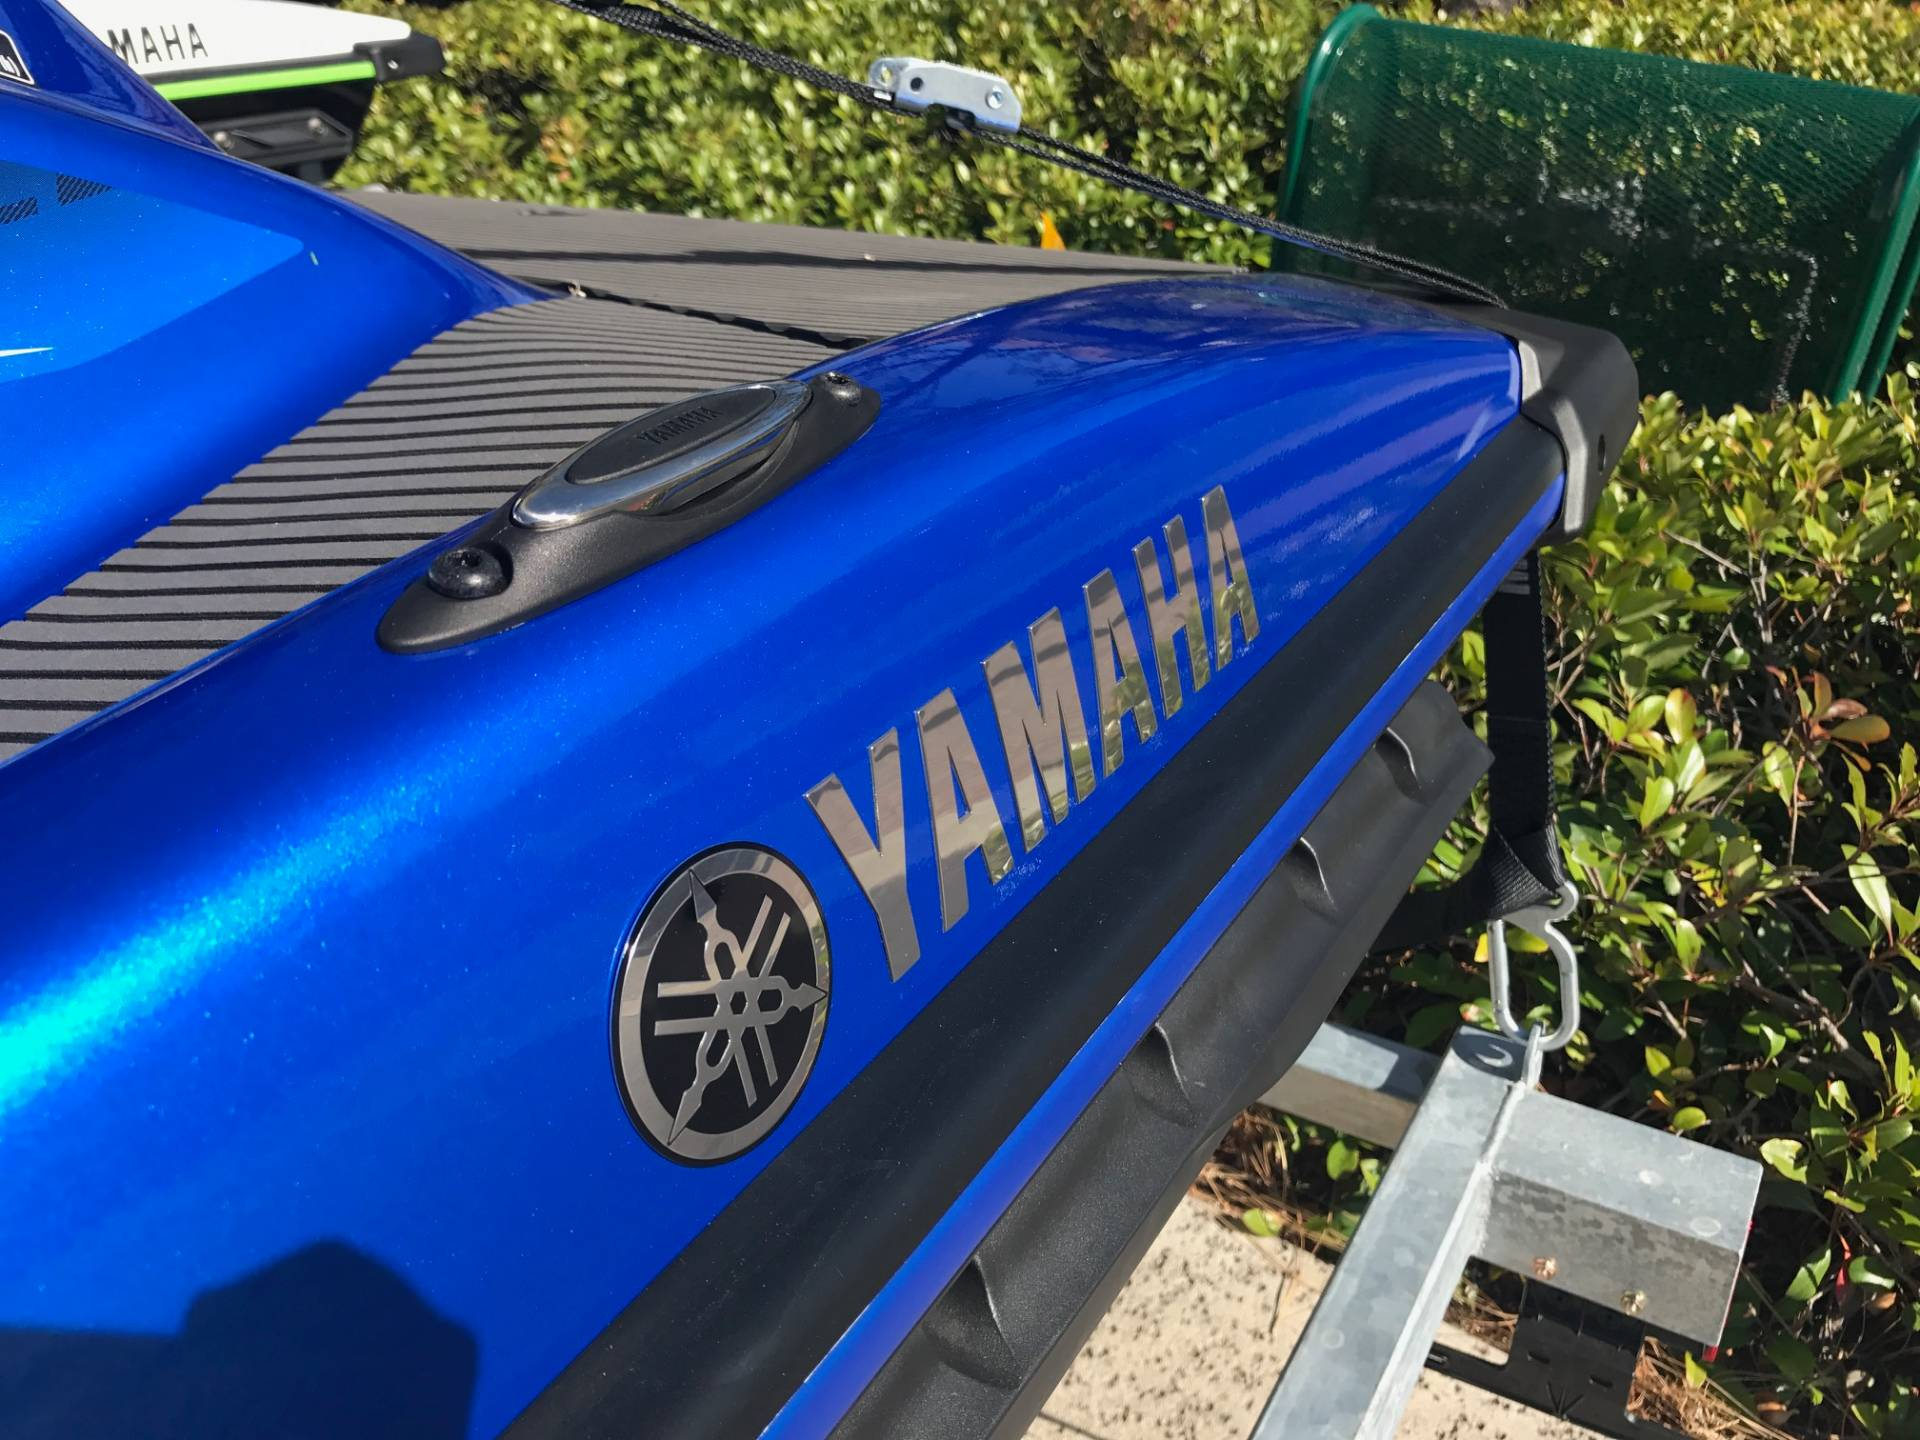 2017 Yamaha VX Limited 7